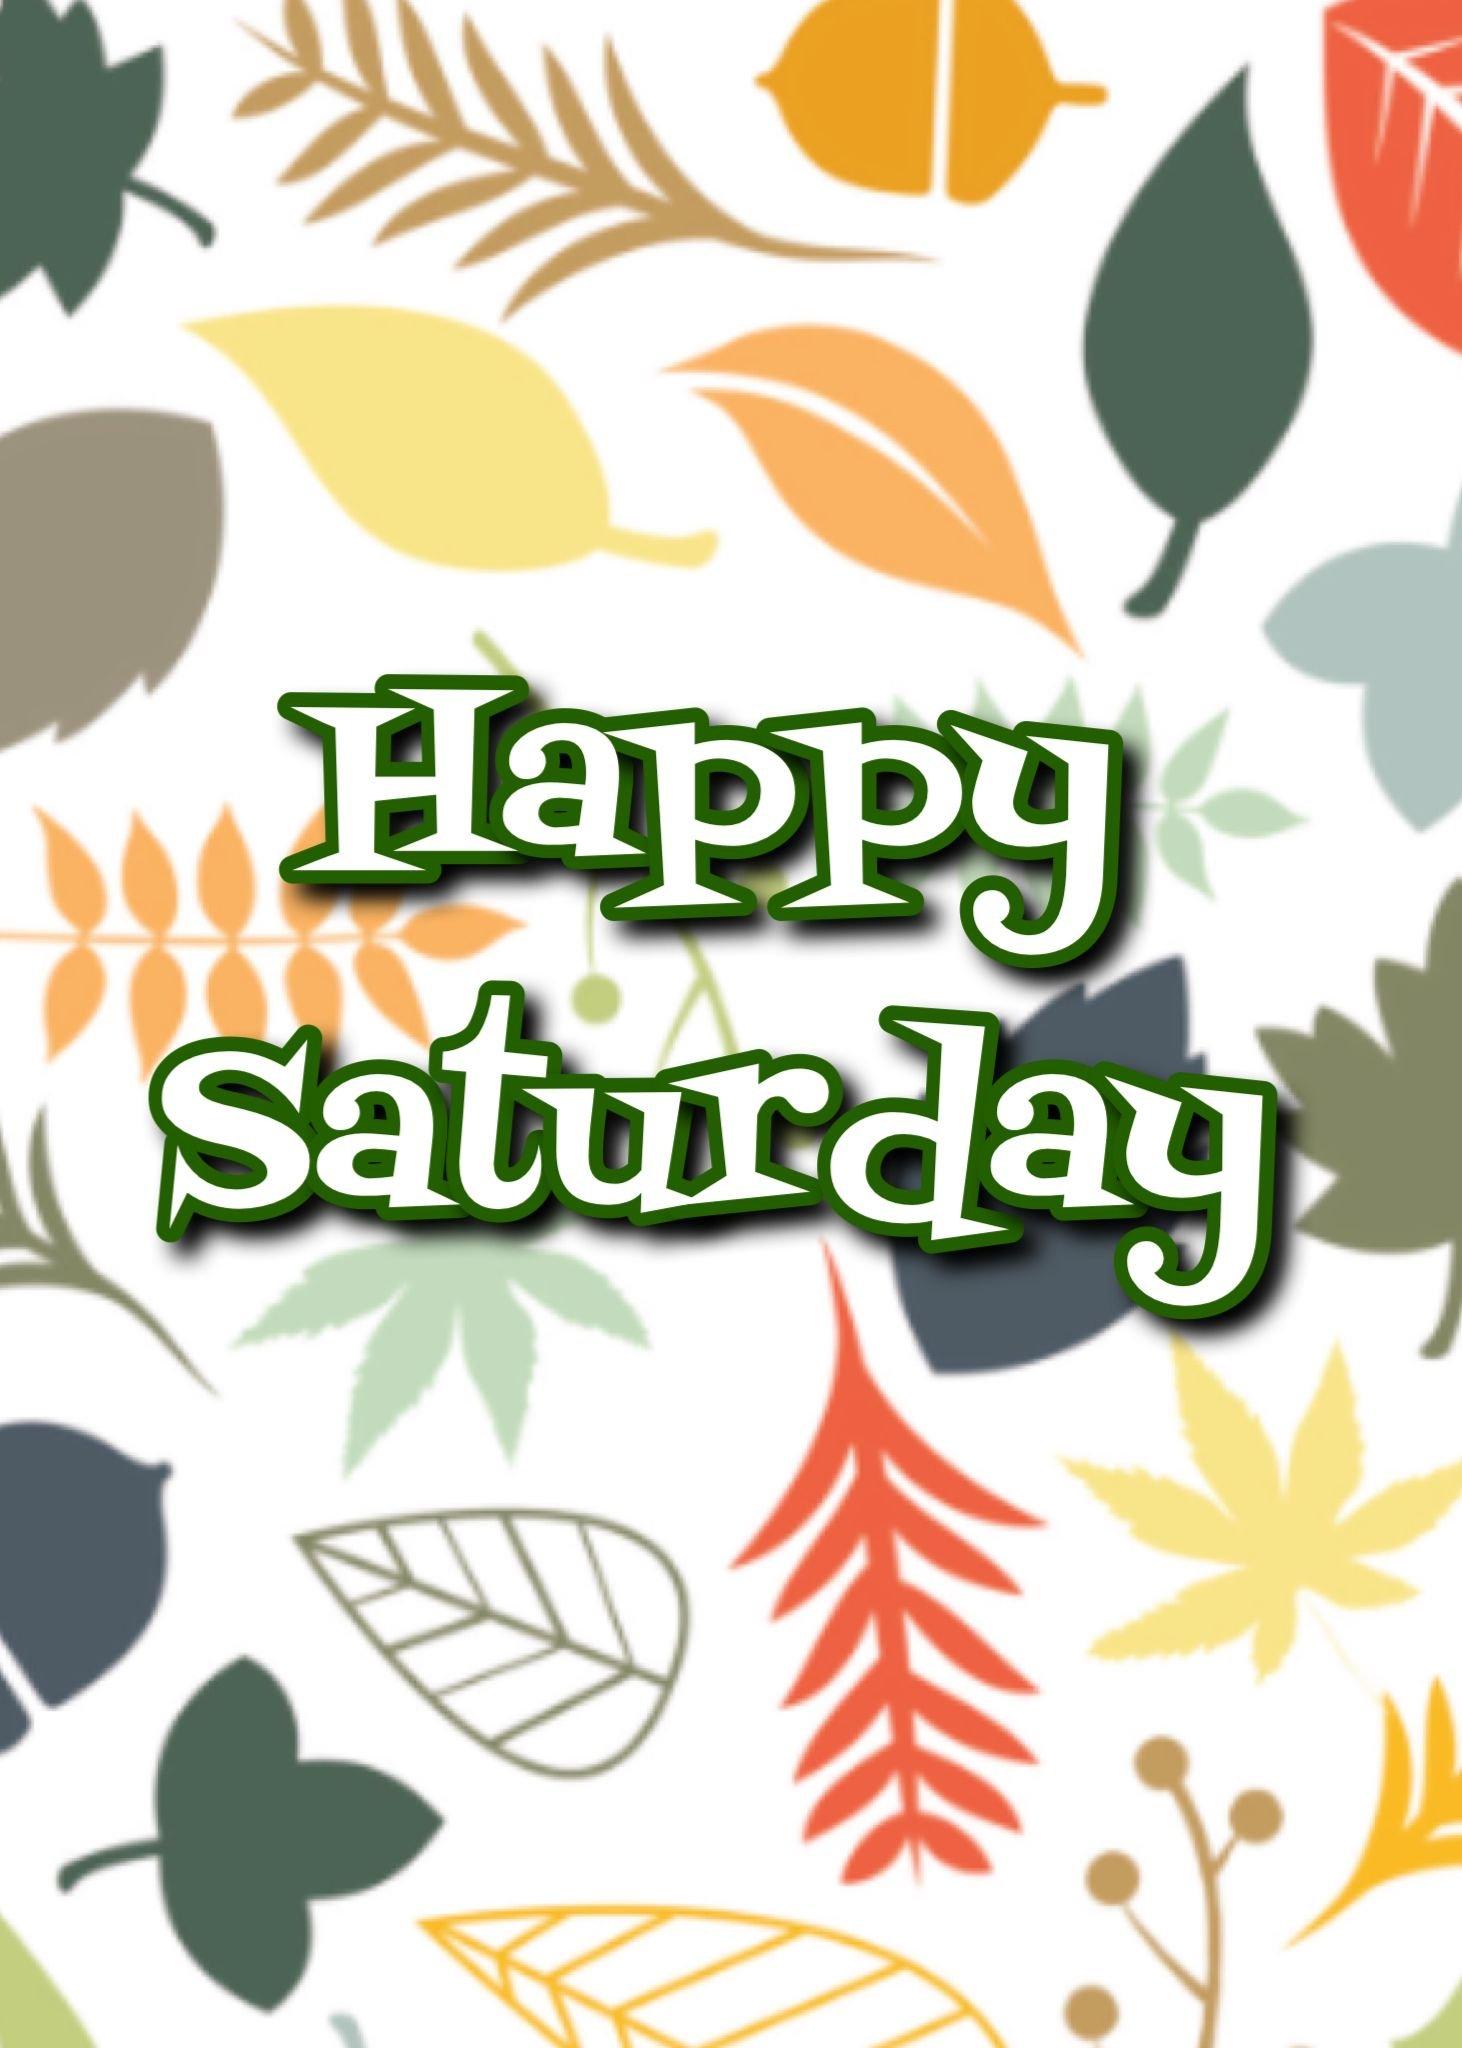 Saturday | Saturday Greetings, Saturday Quotes, Saturday 2 Week Calender Block Printable Sunday To Sunday